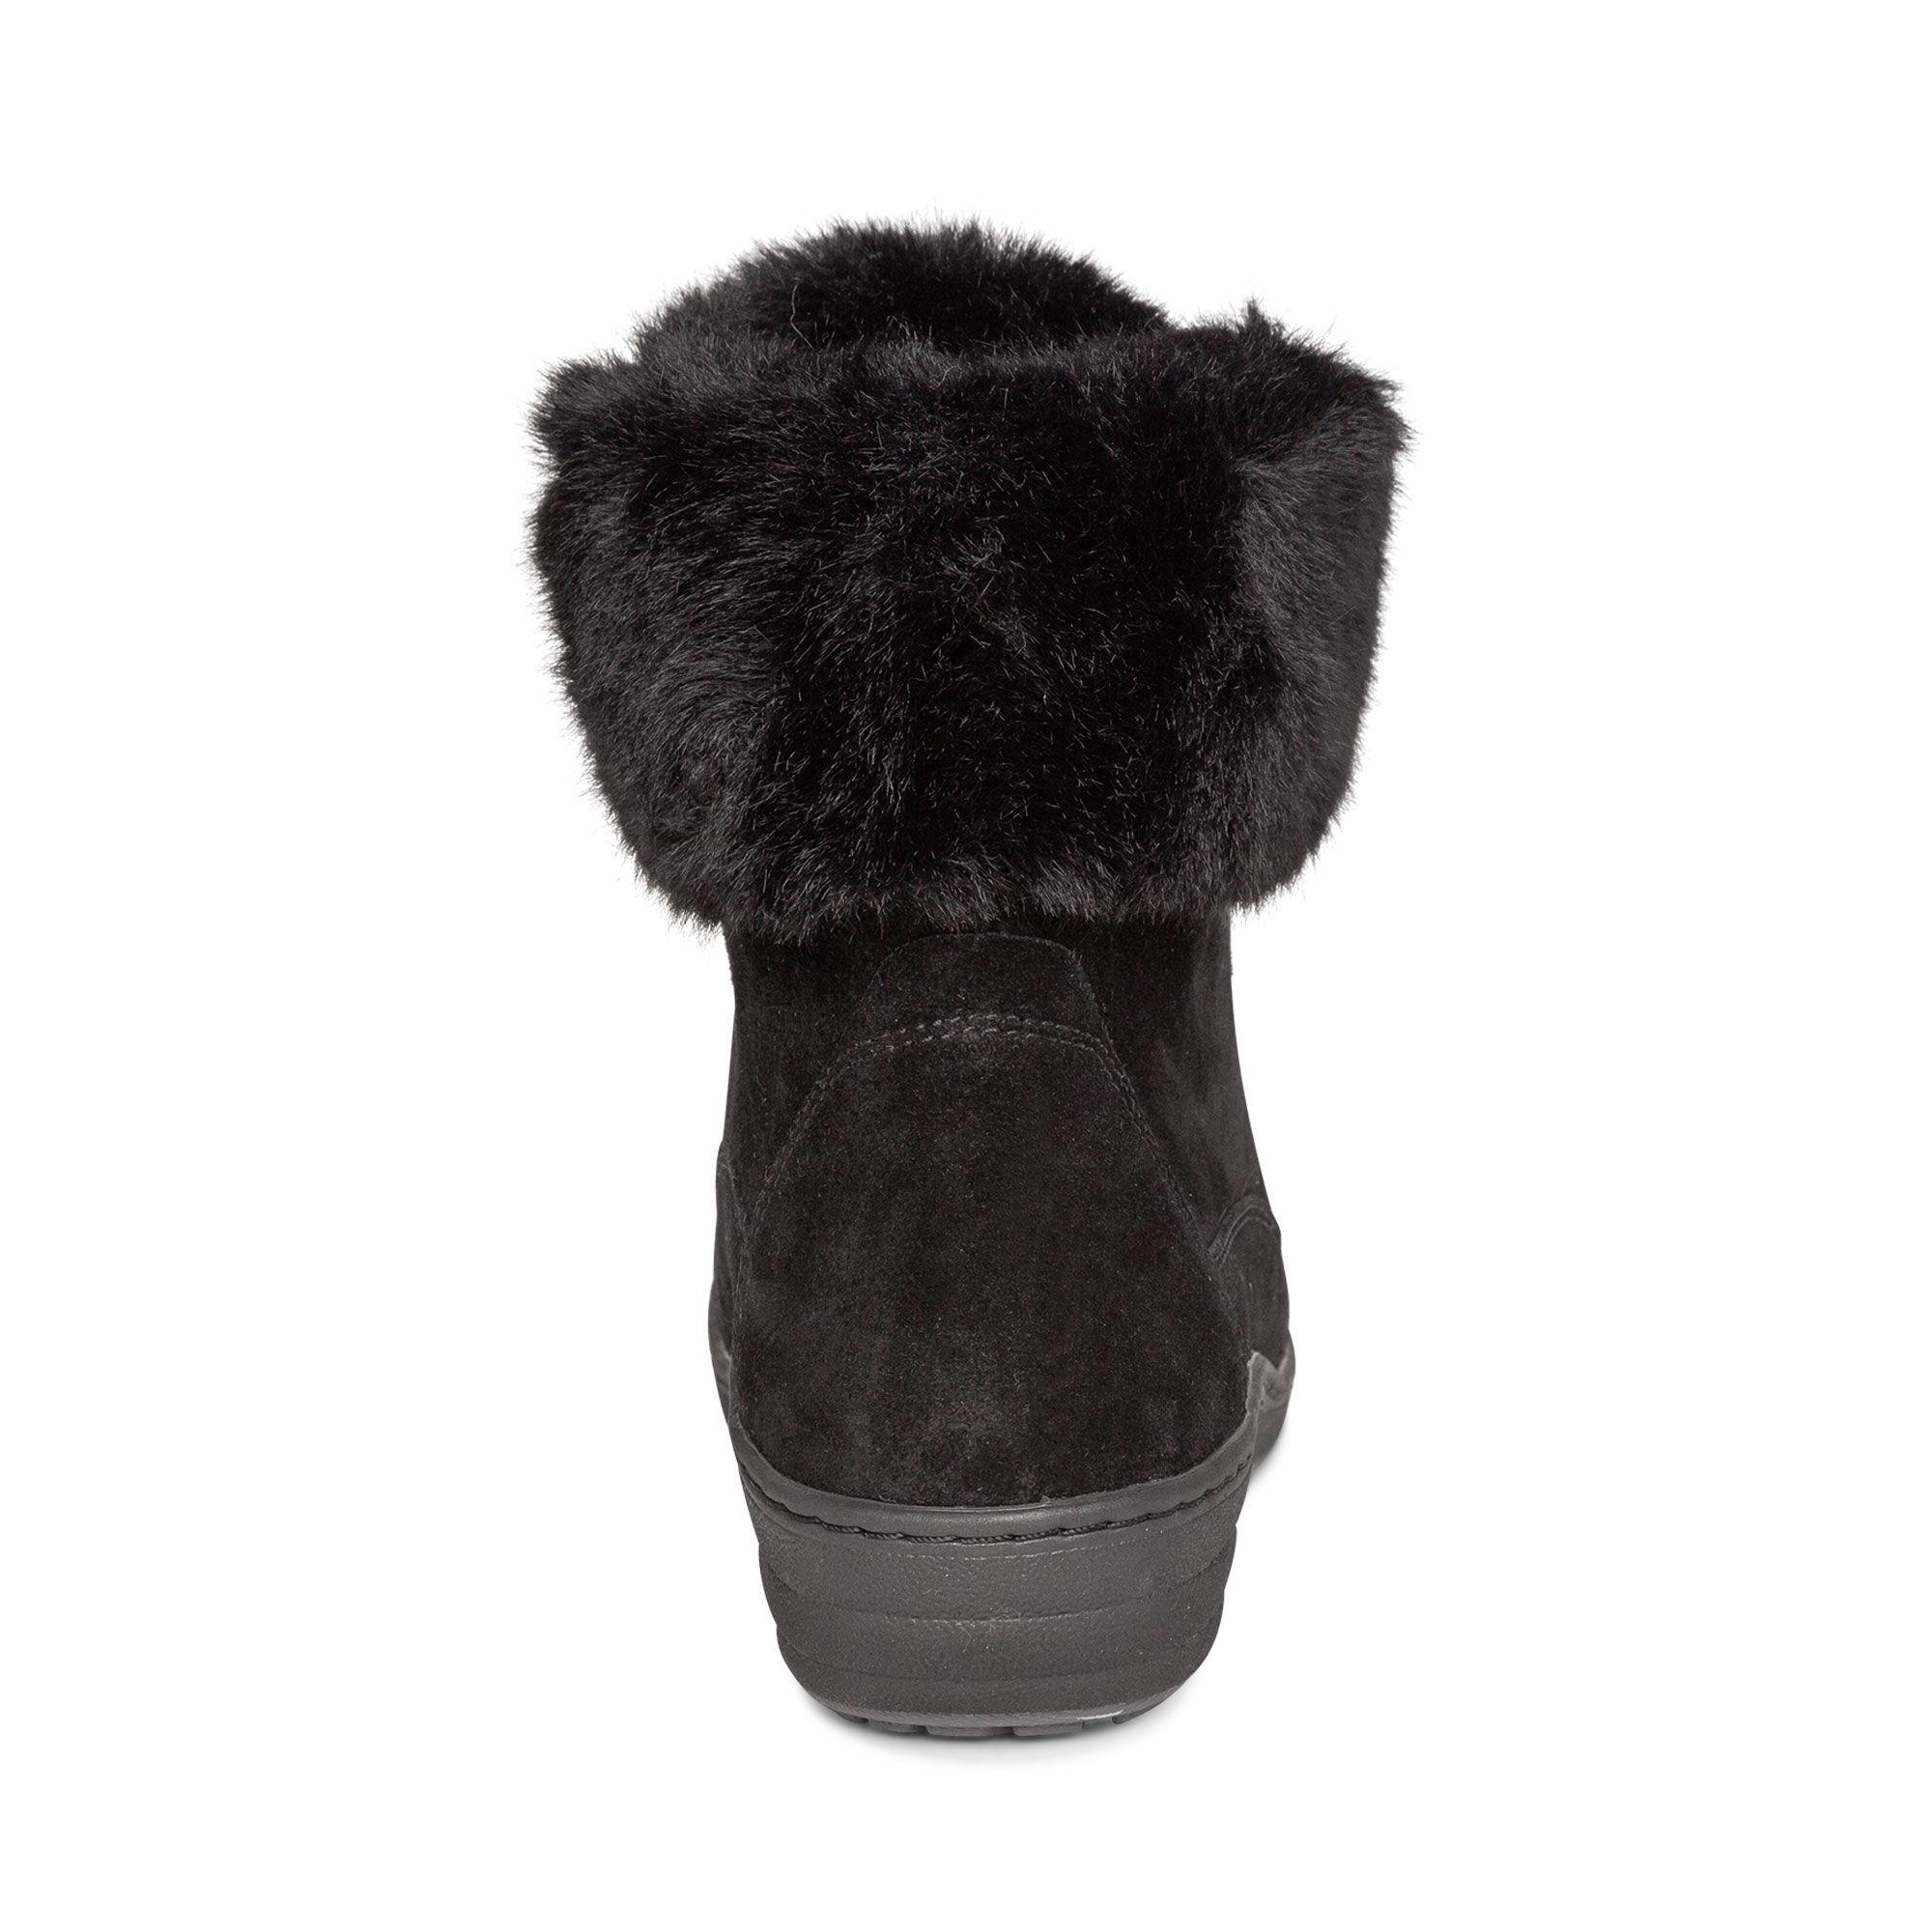 Jodie Fur Winter Boot - Black